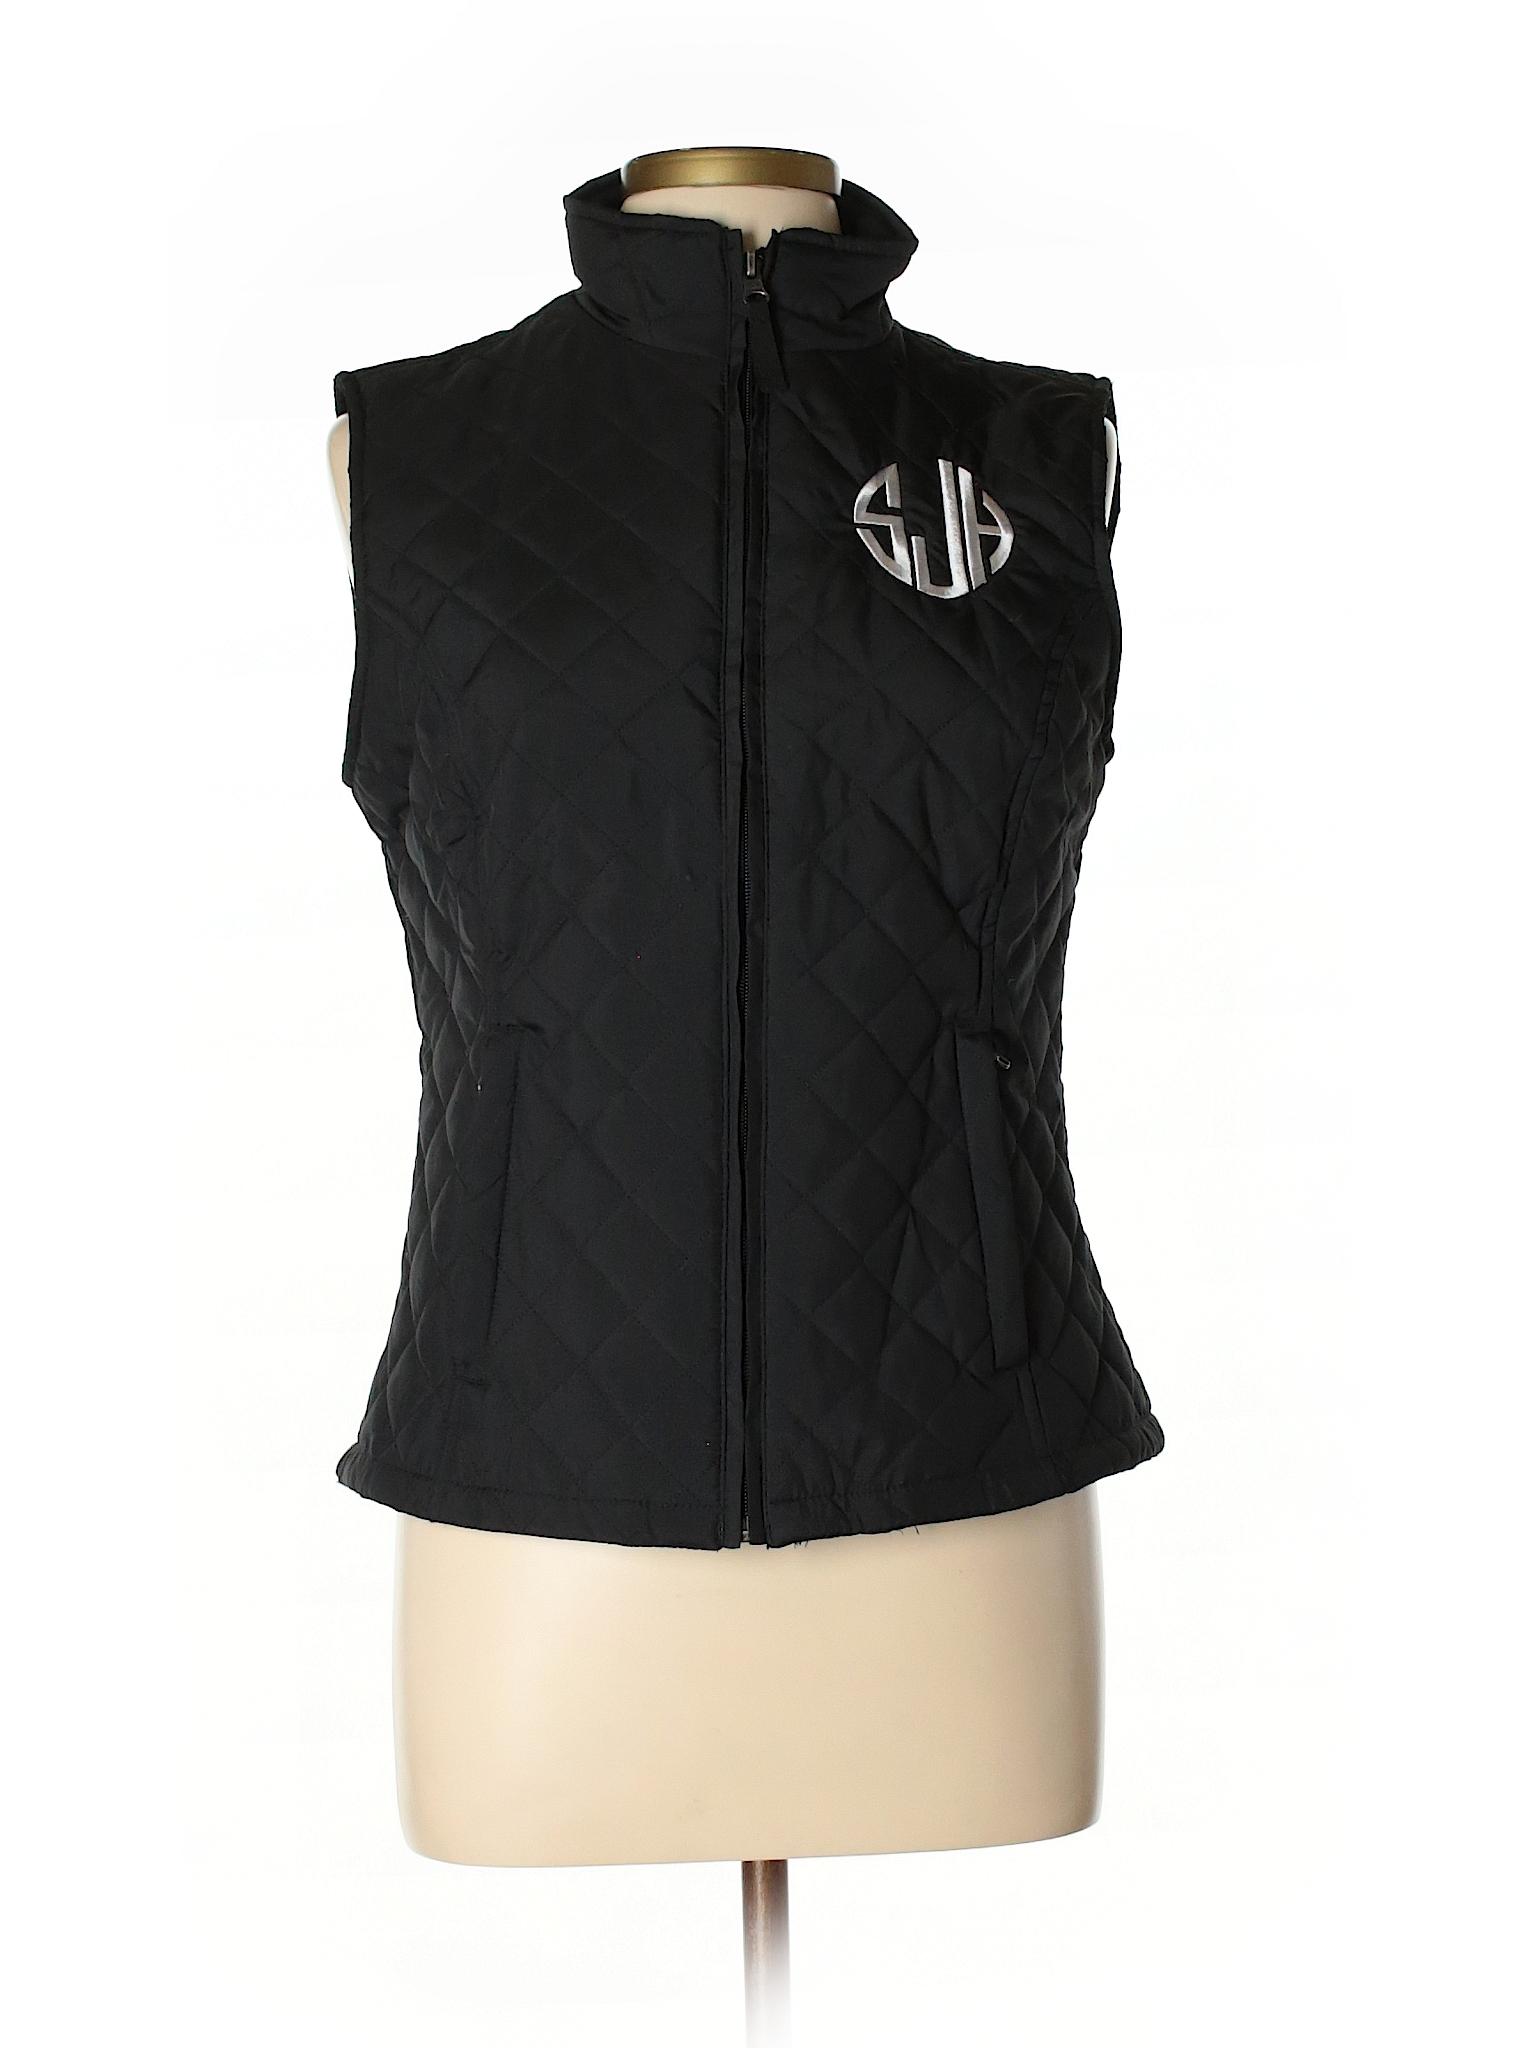 River Winter Vest Apparel Charles Boutique wnH7qgZq